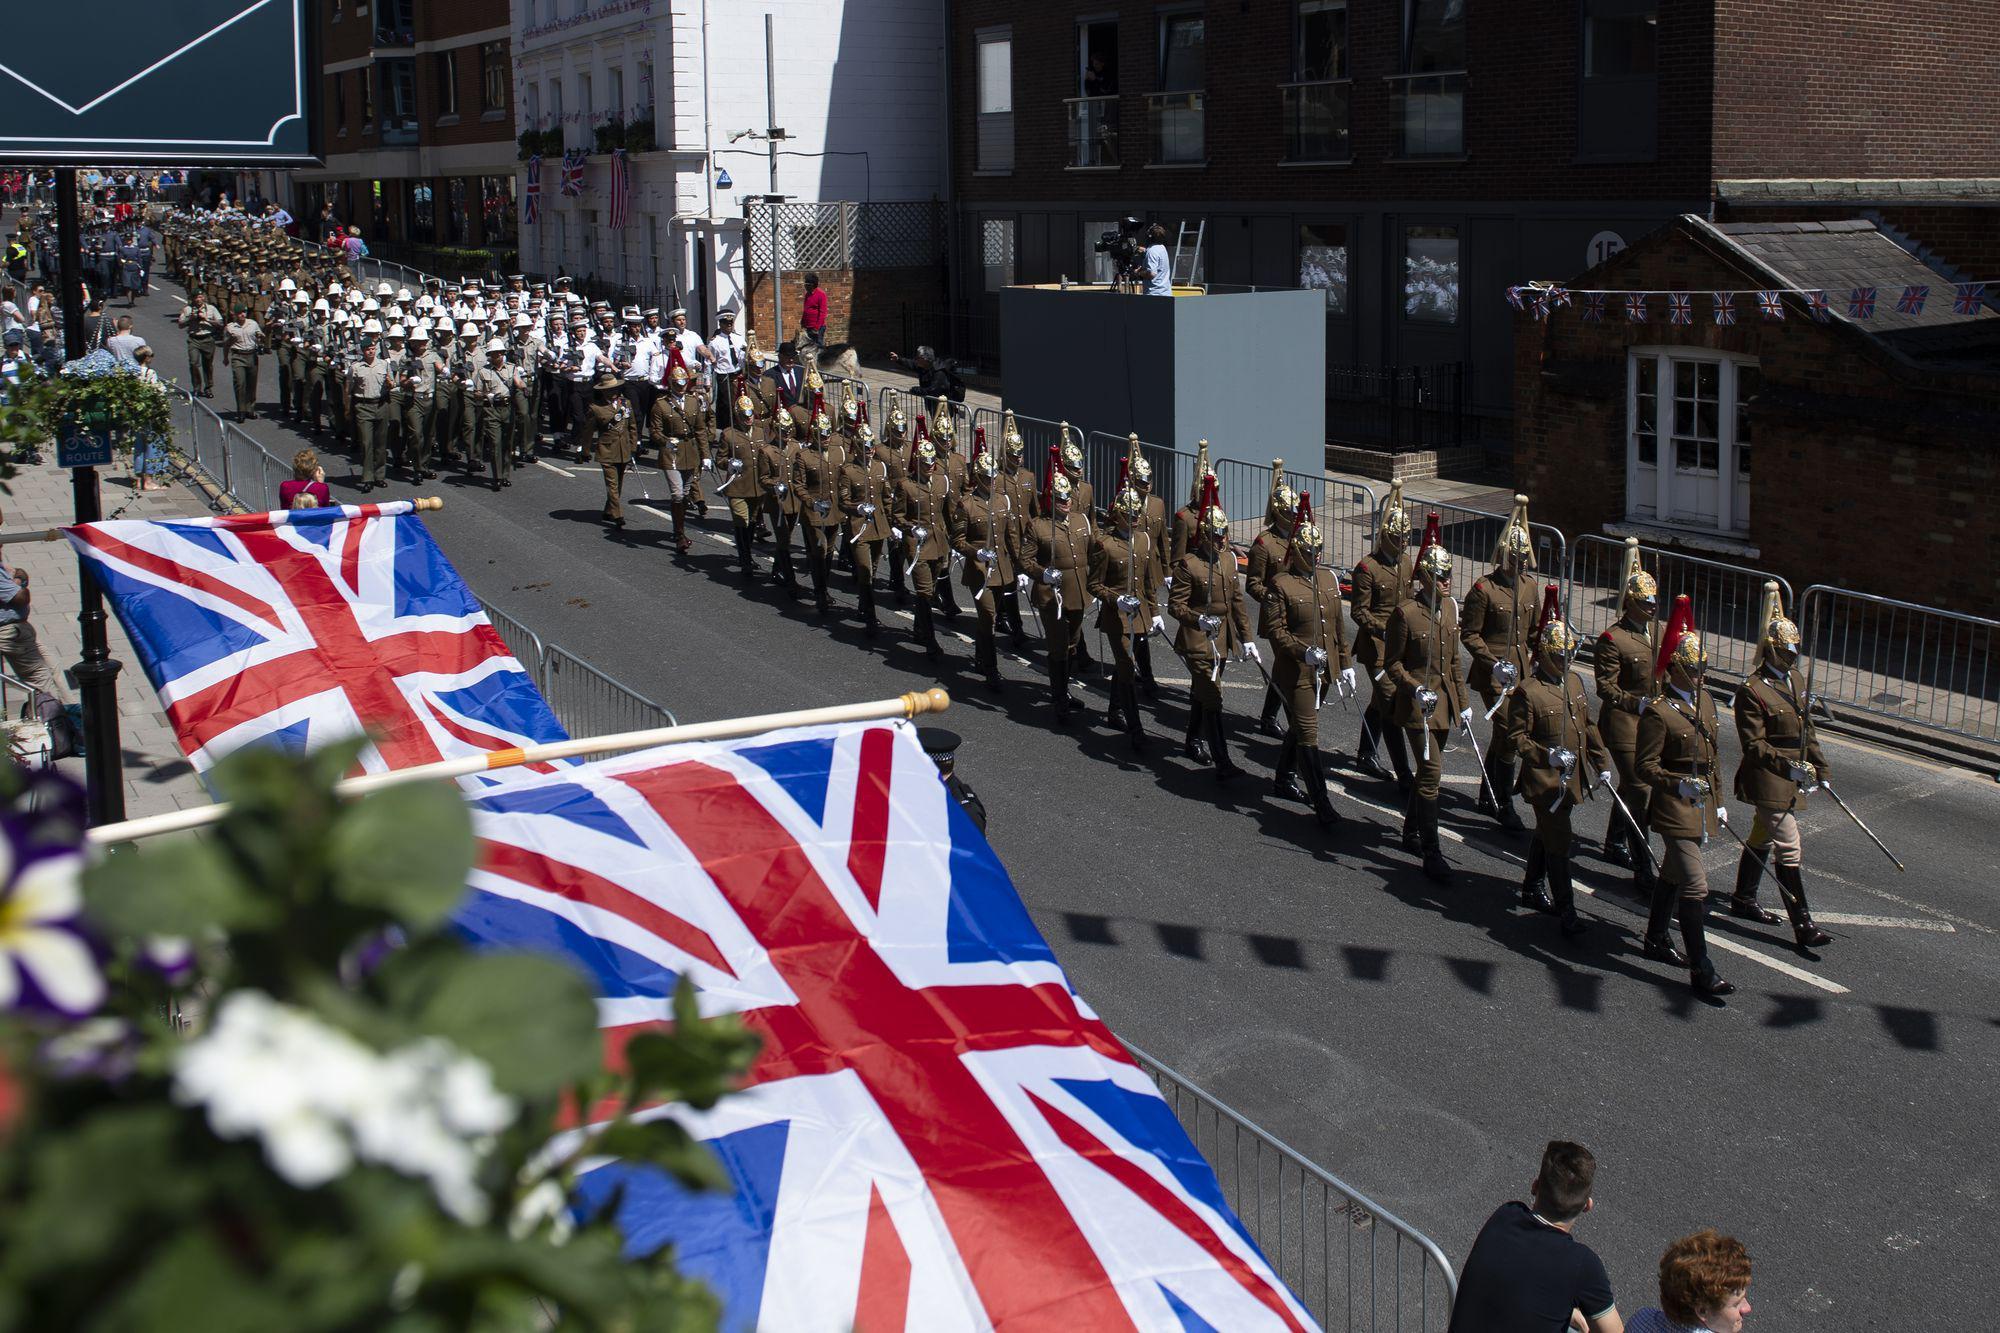 Windsor prepares for royal wedding of Prince Harry and Meghan Markle